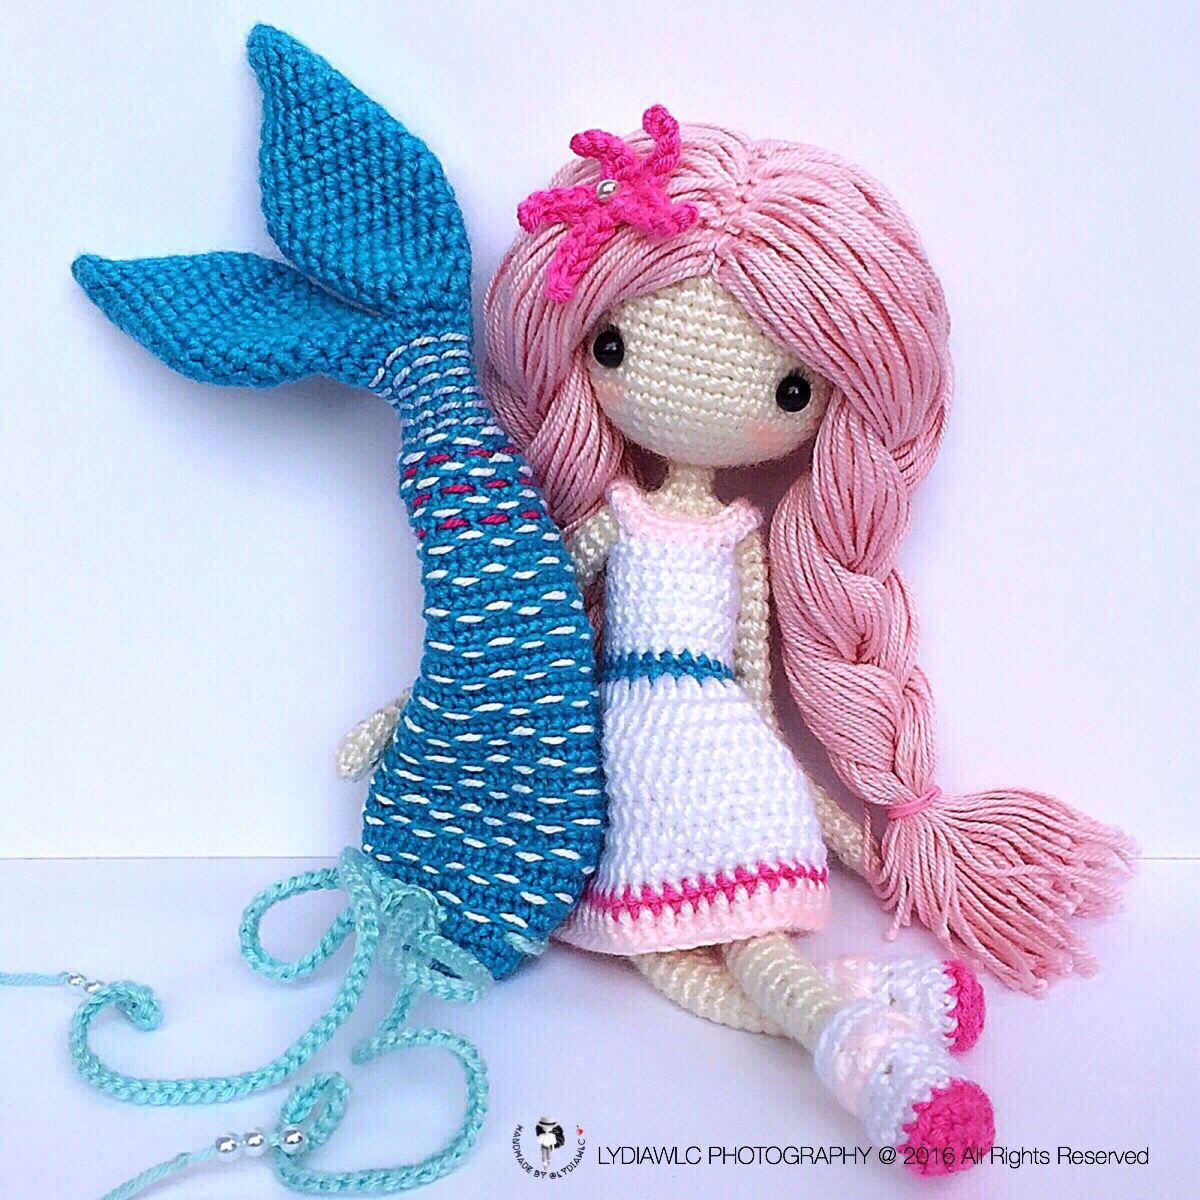 English Crochet Doll Pattern Mermaid Ava艾娃 A Crochet Doll With